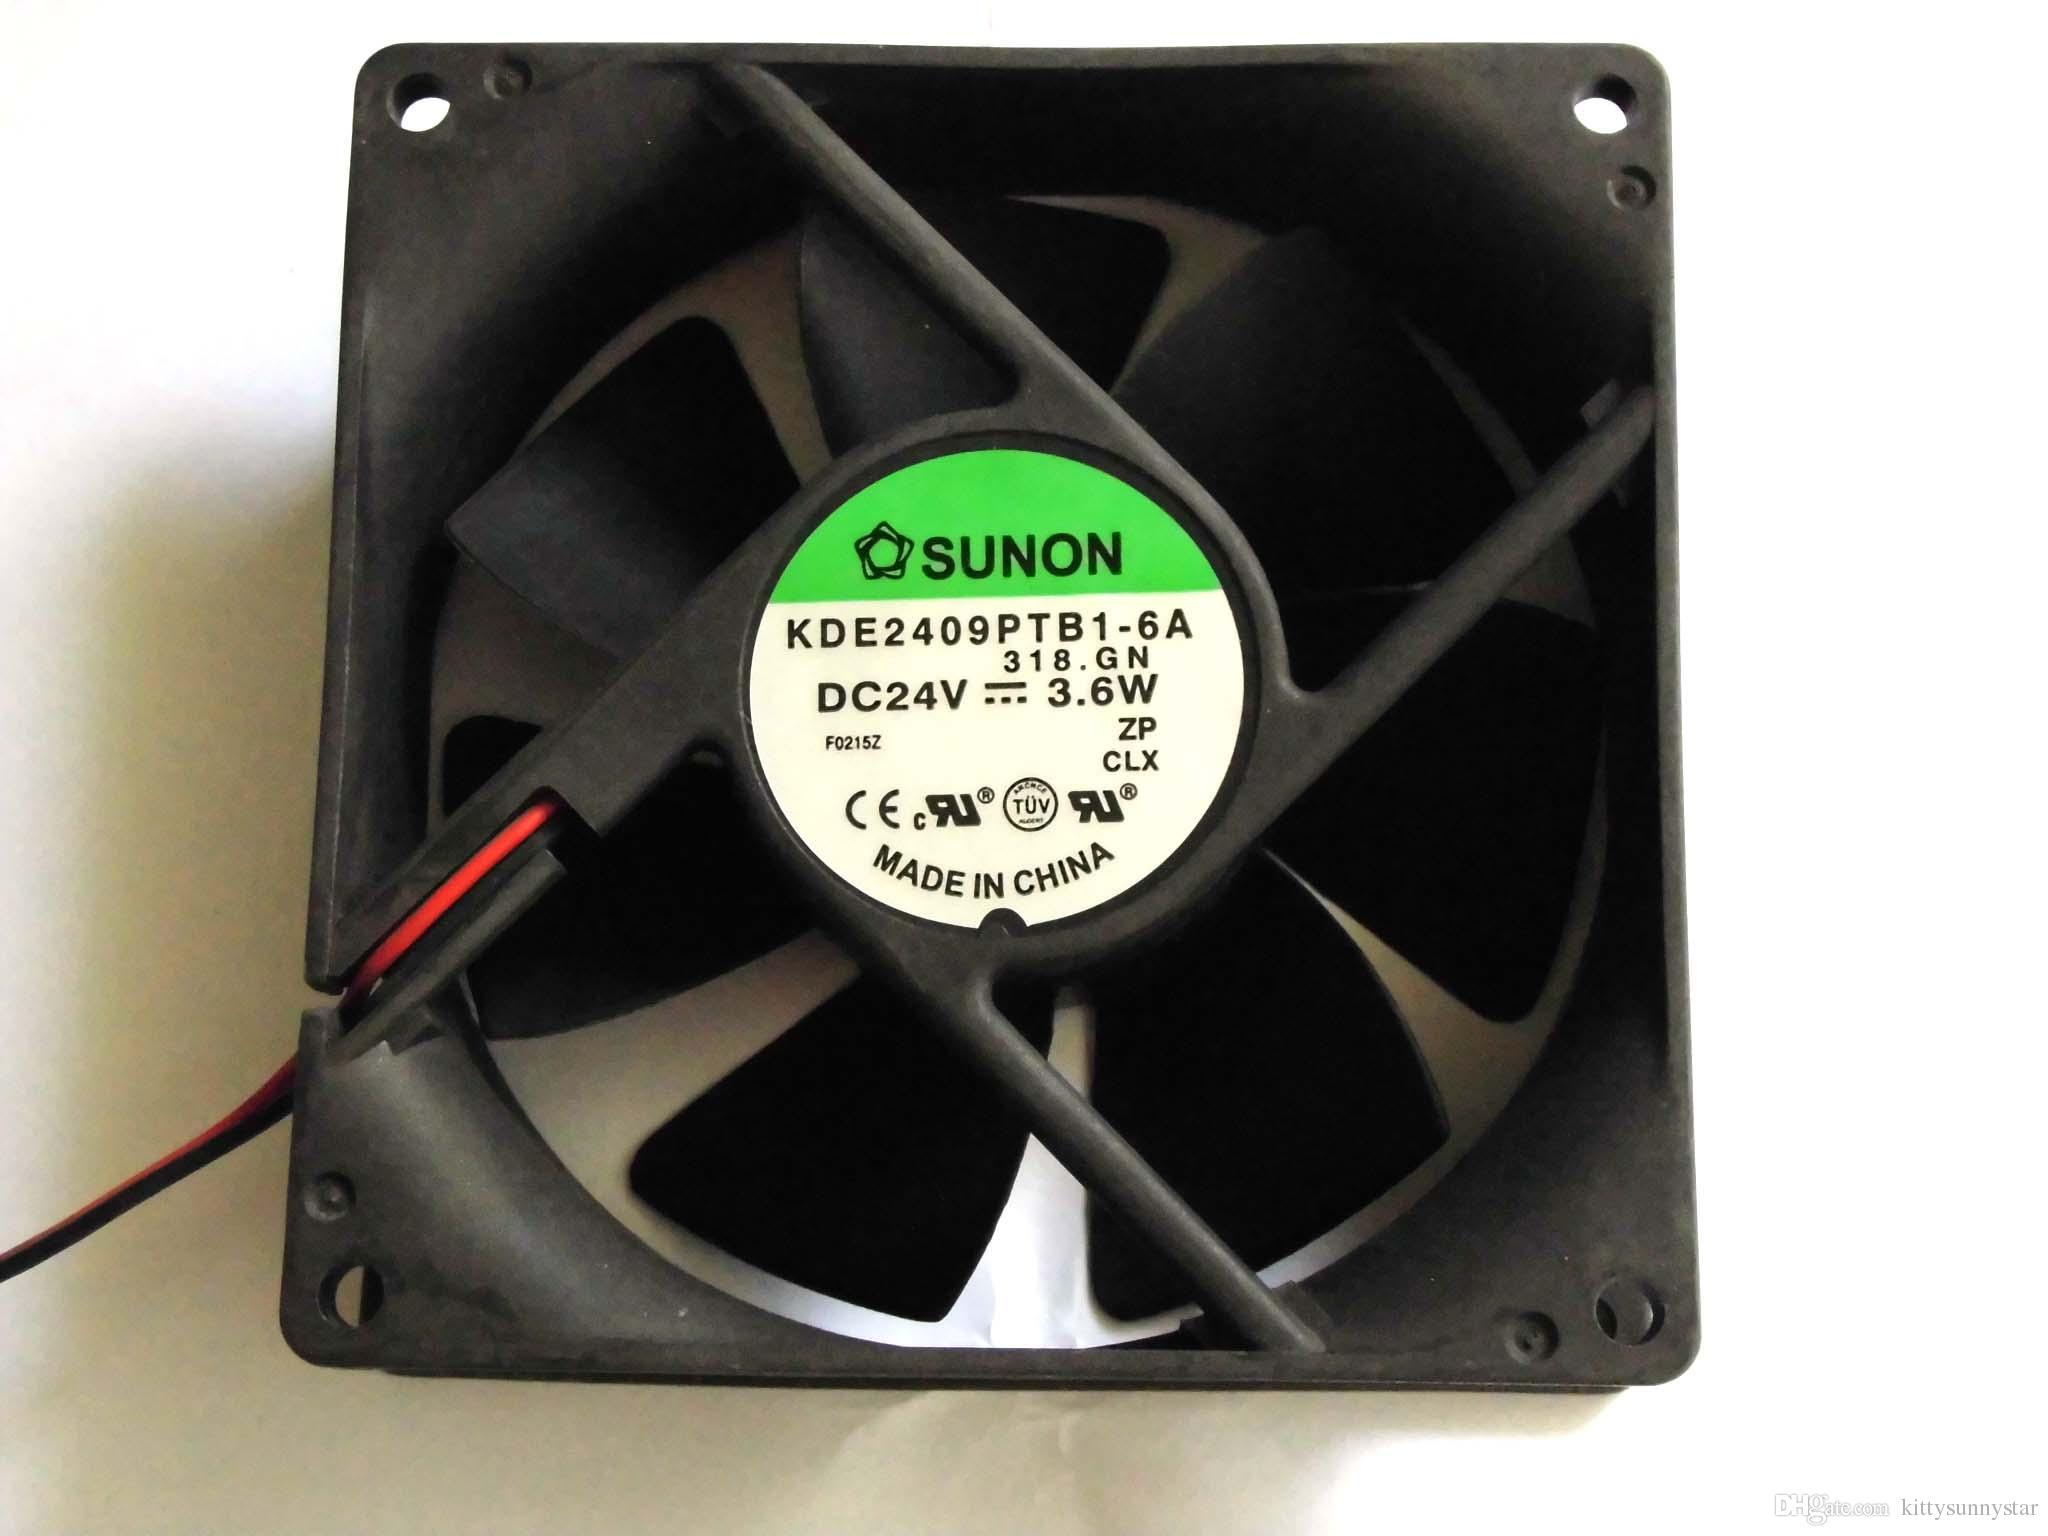 Ventilateur Inverseur SUNON 9225 KDE2409PTB1-6A 24V 3.6W